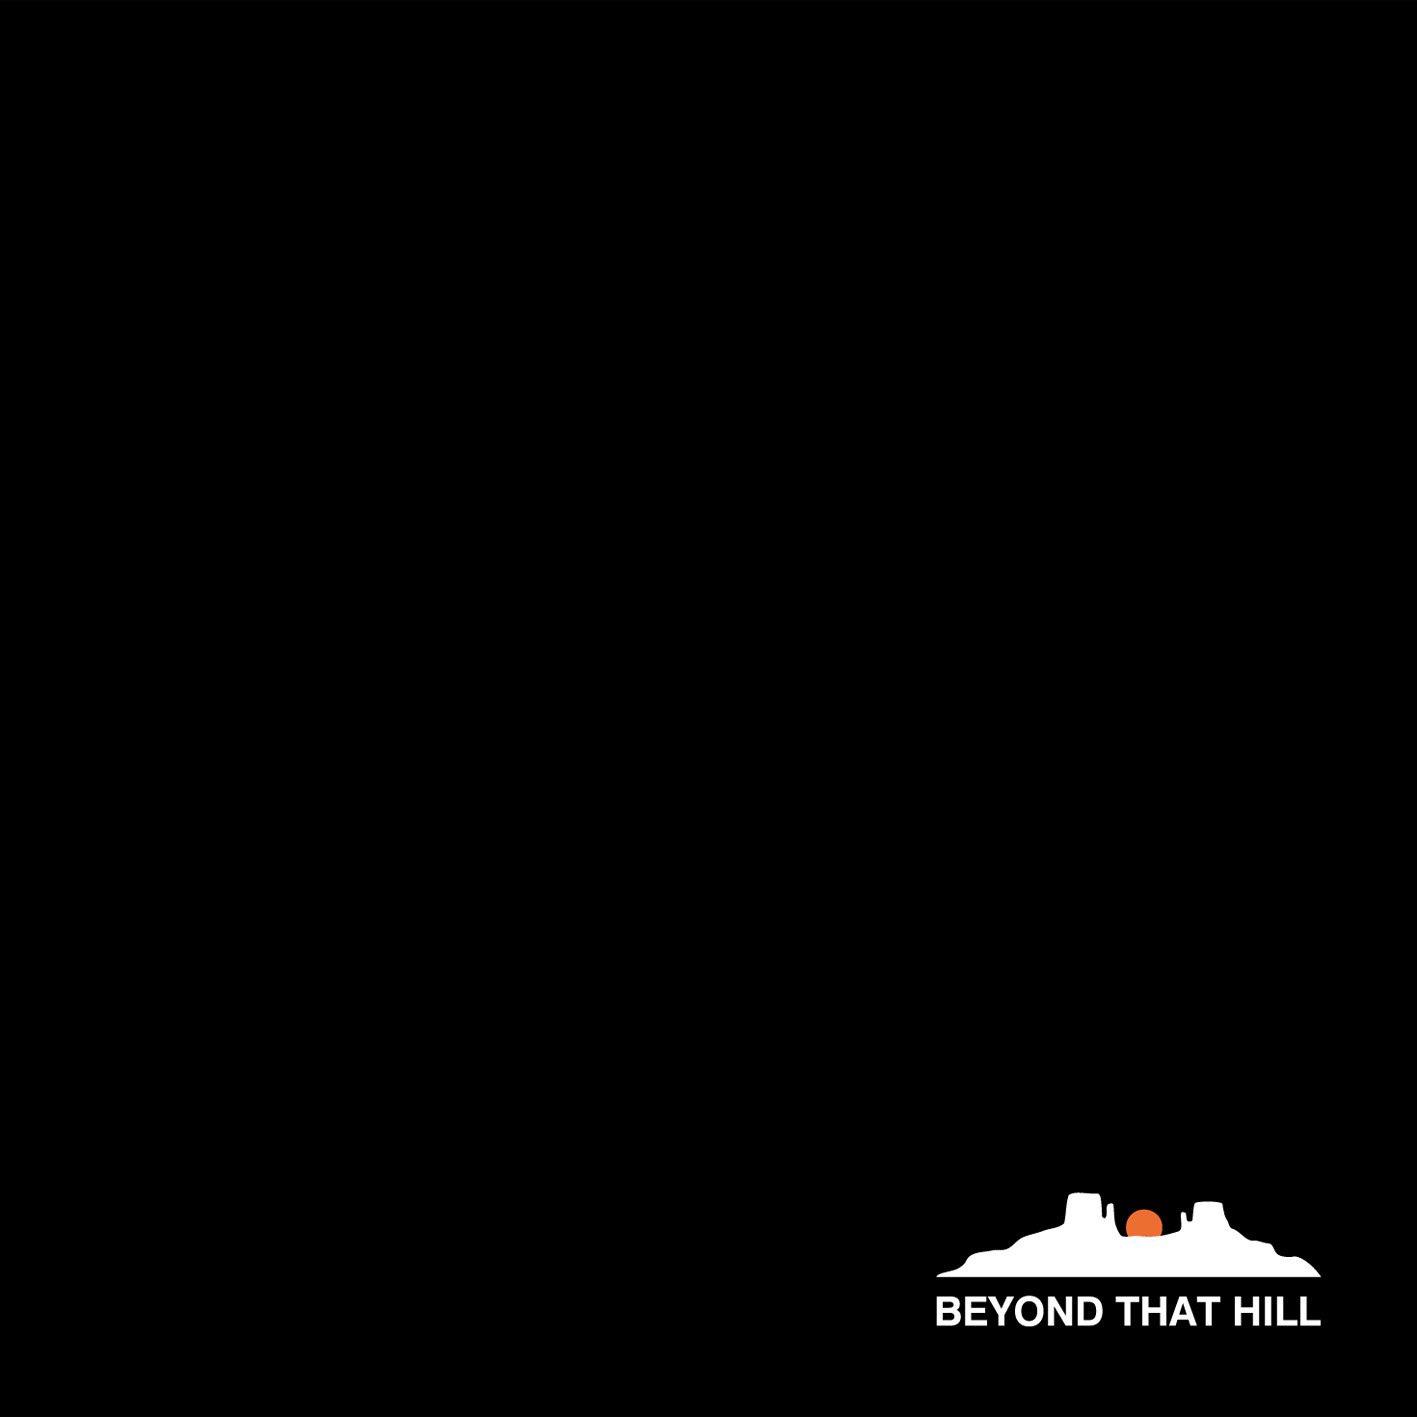 Dusty Kid album Beyond That Hill